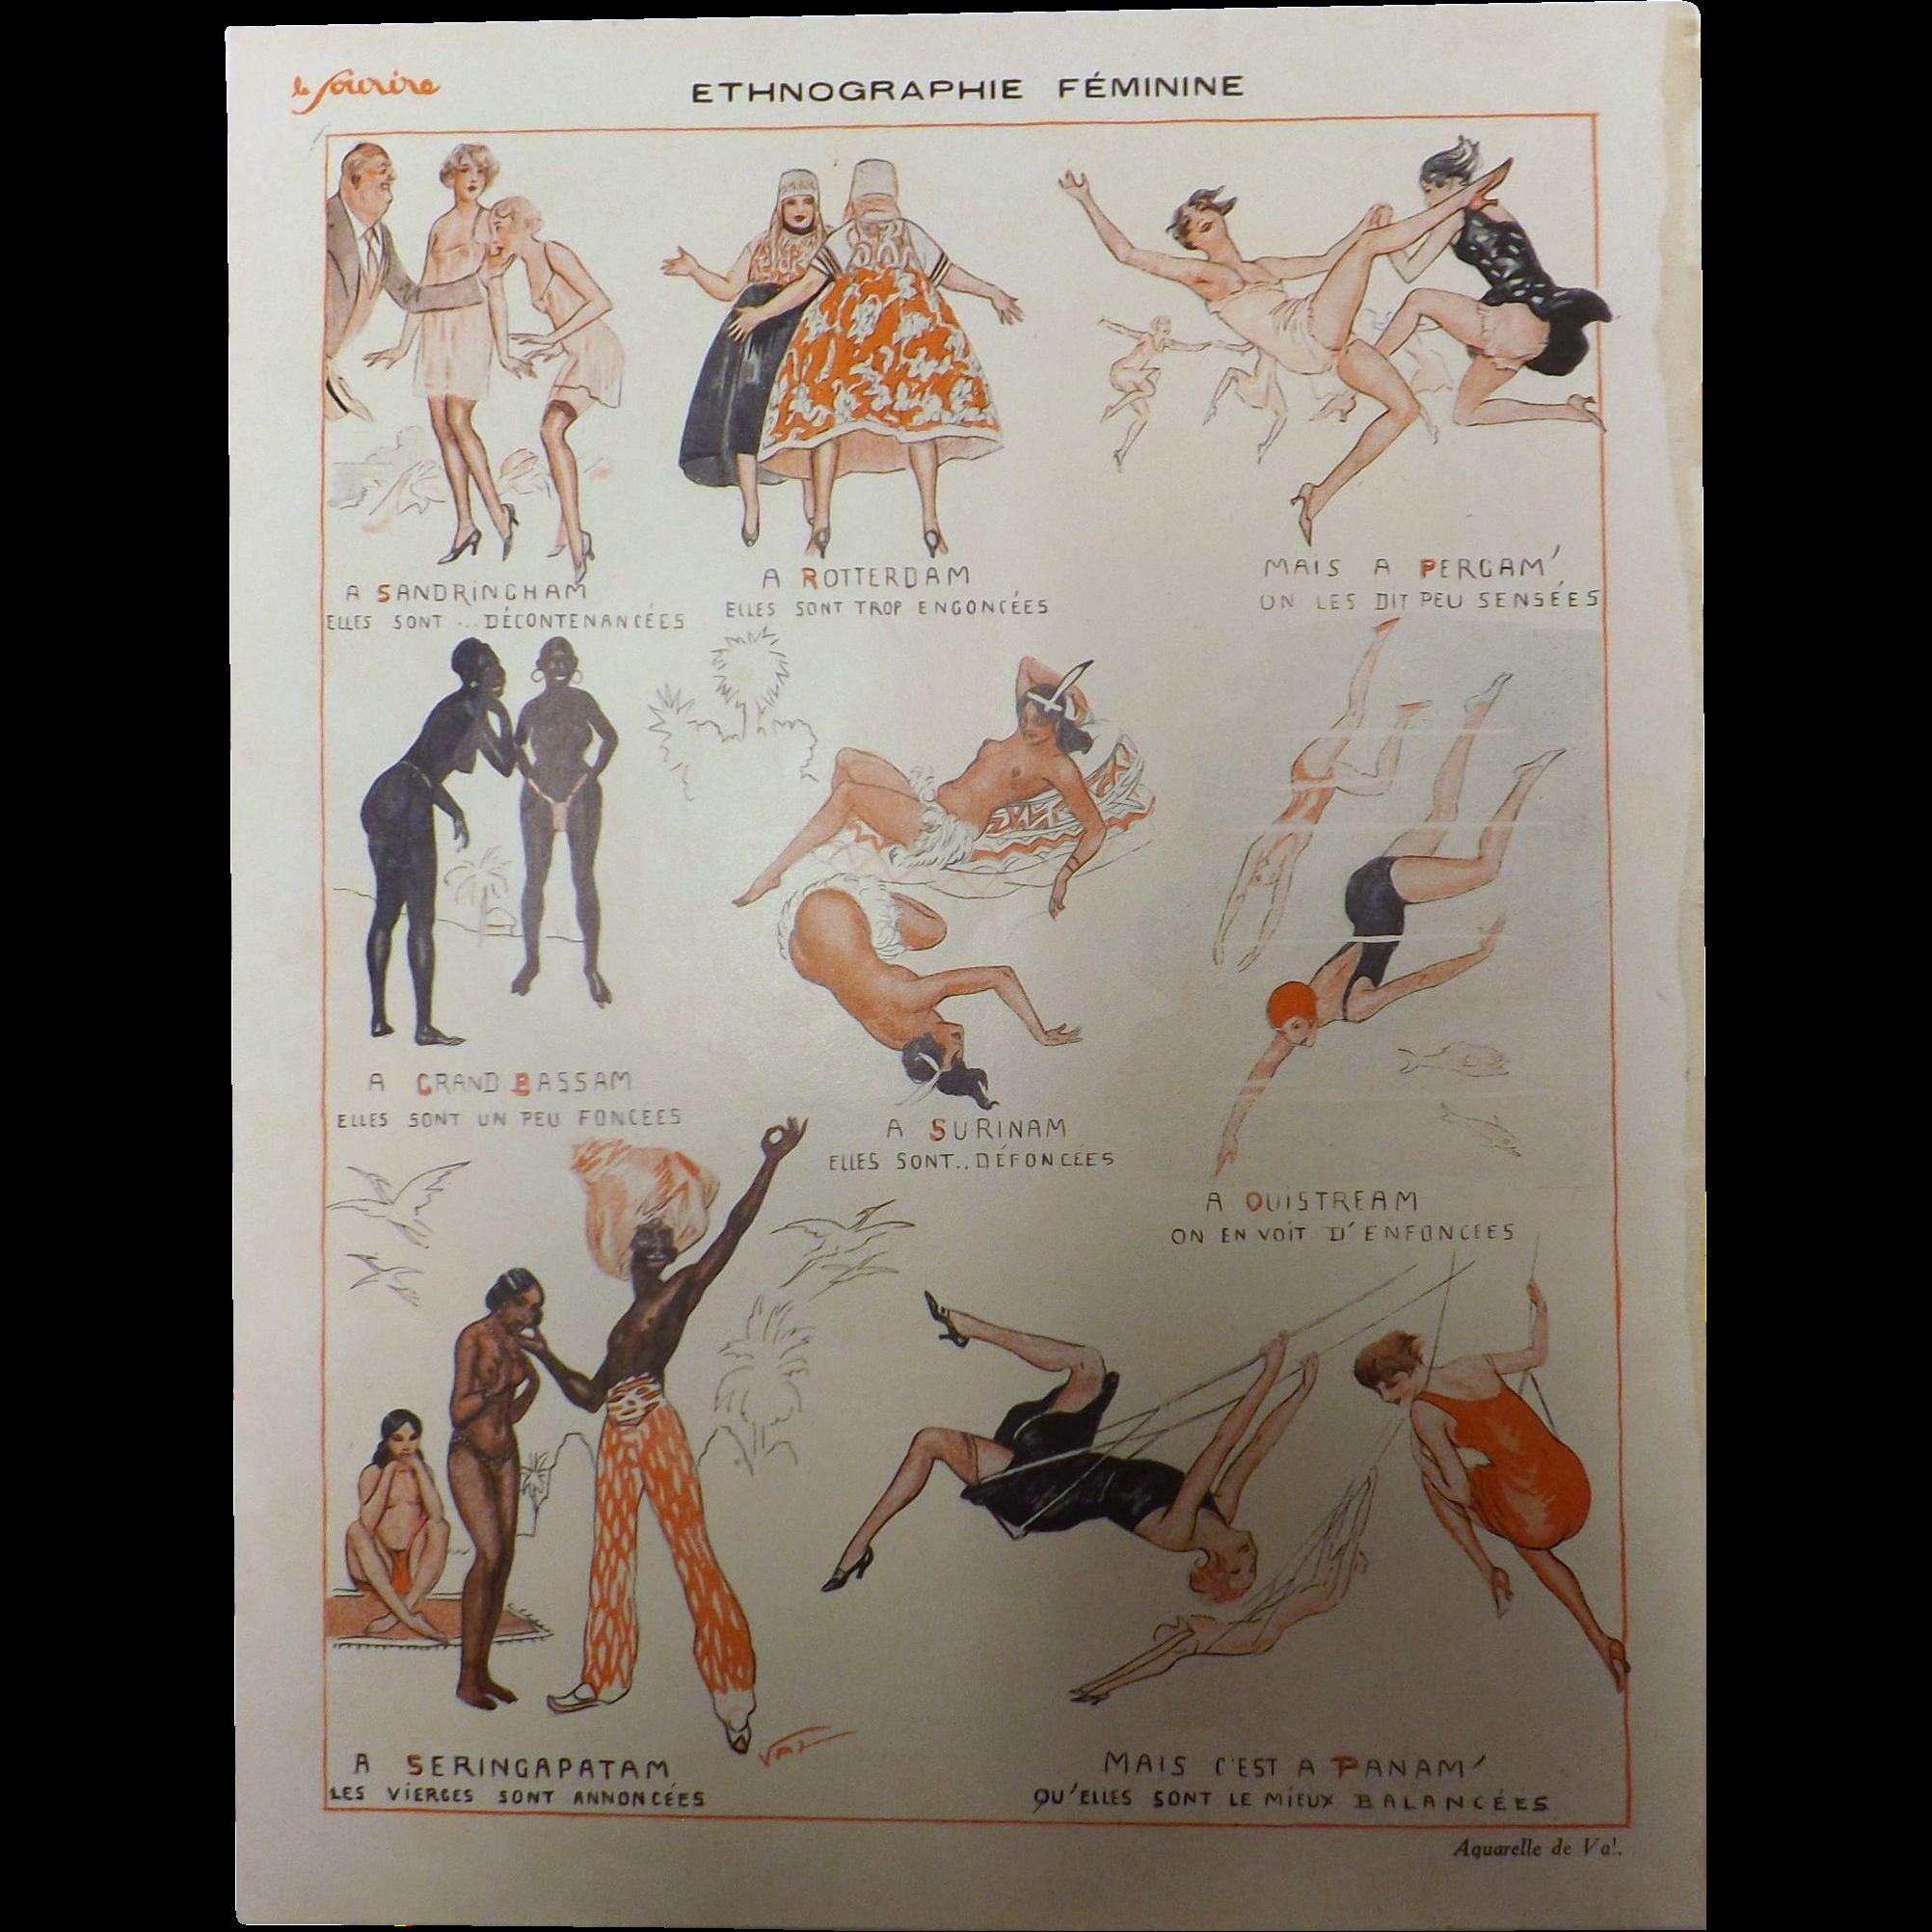 Risque French Cartoon 'Ethnographie Feminine' - Sourire Magazine 1931